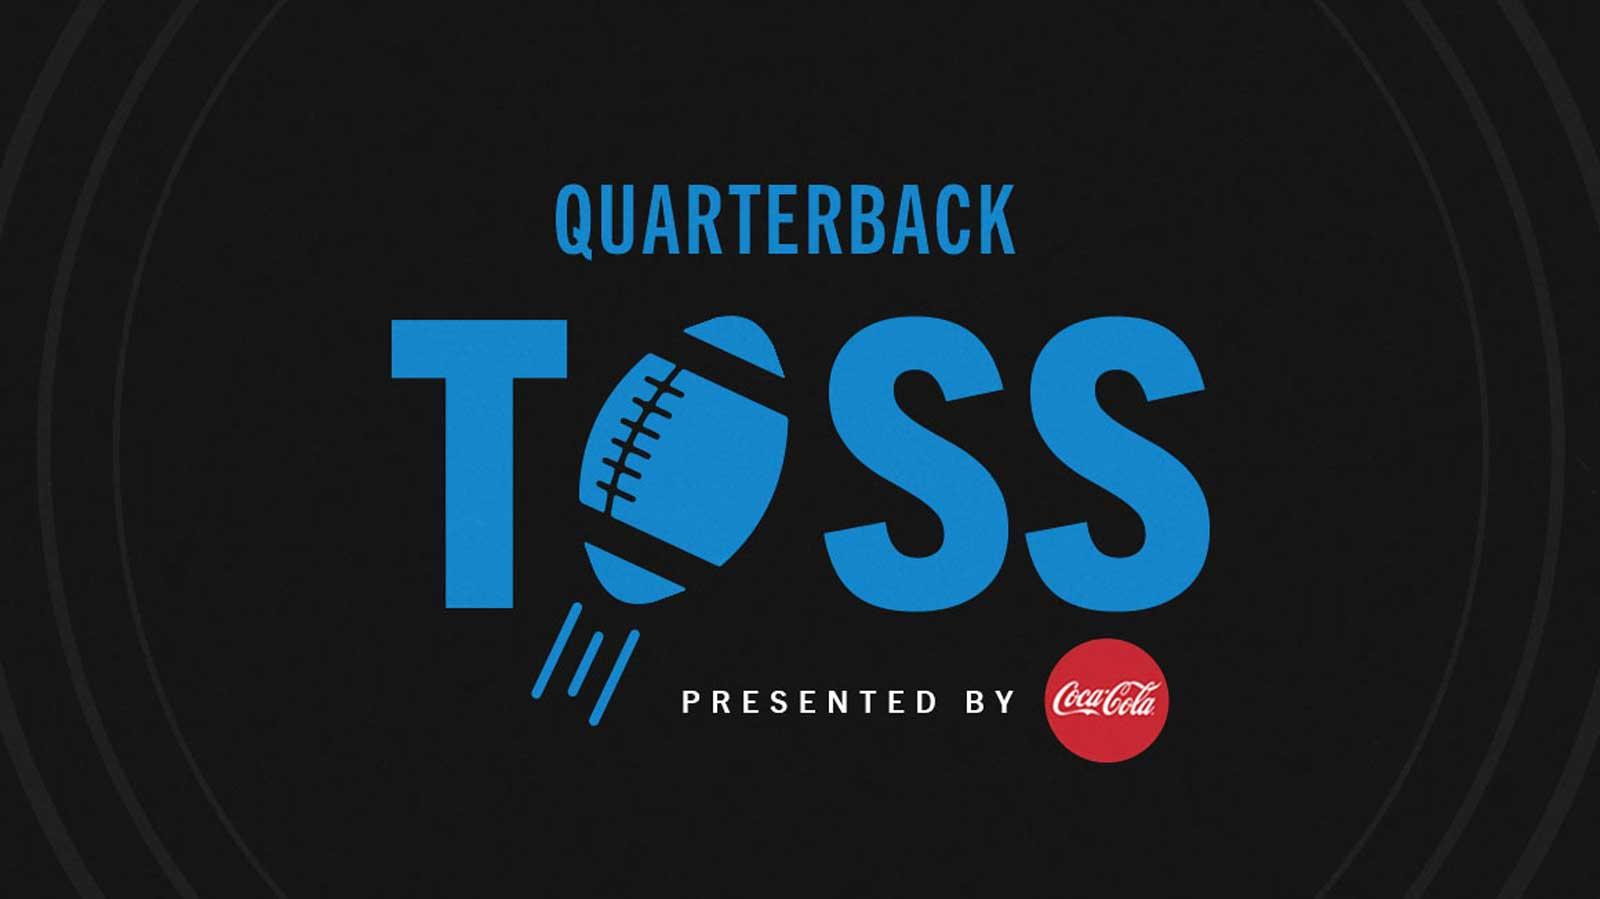 Coca-Cola Quarterback Toss